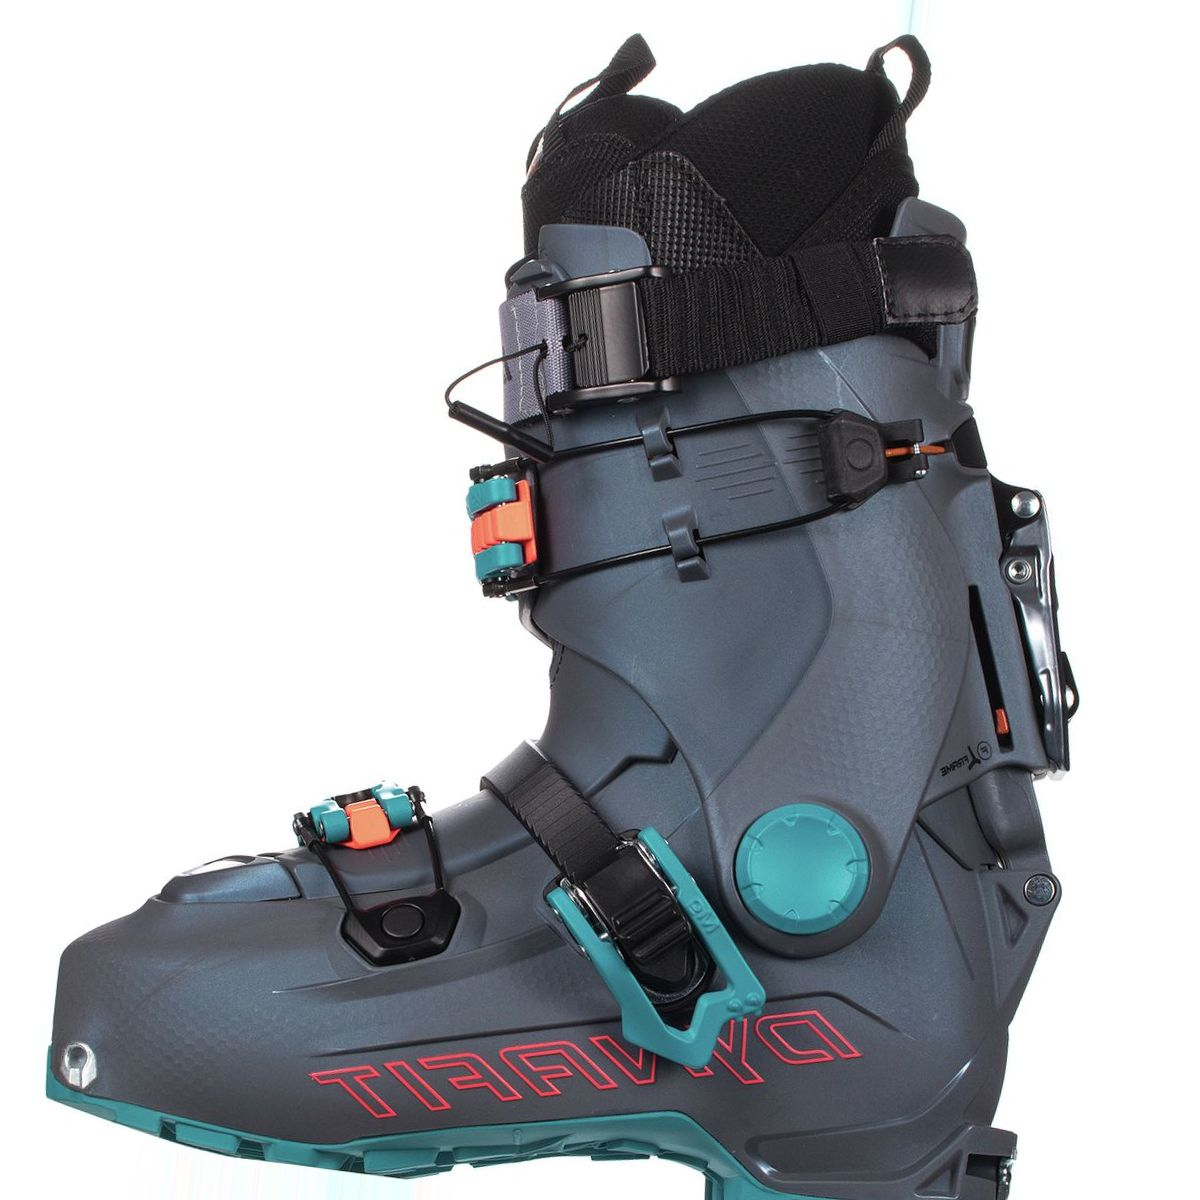 Dynafit Hoji Pro Tour Ski Boot - Women's